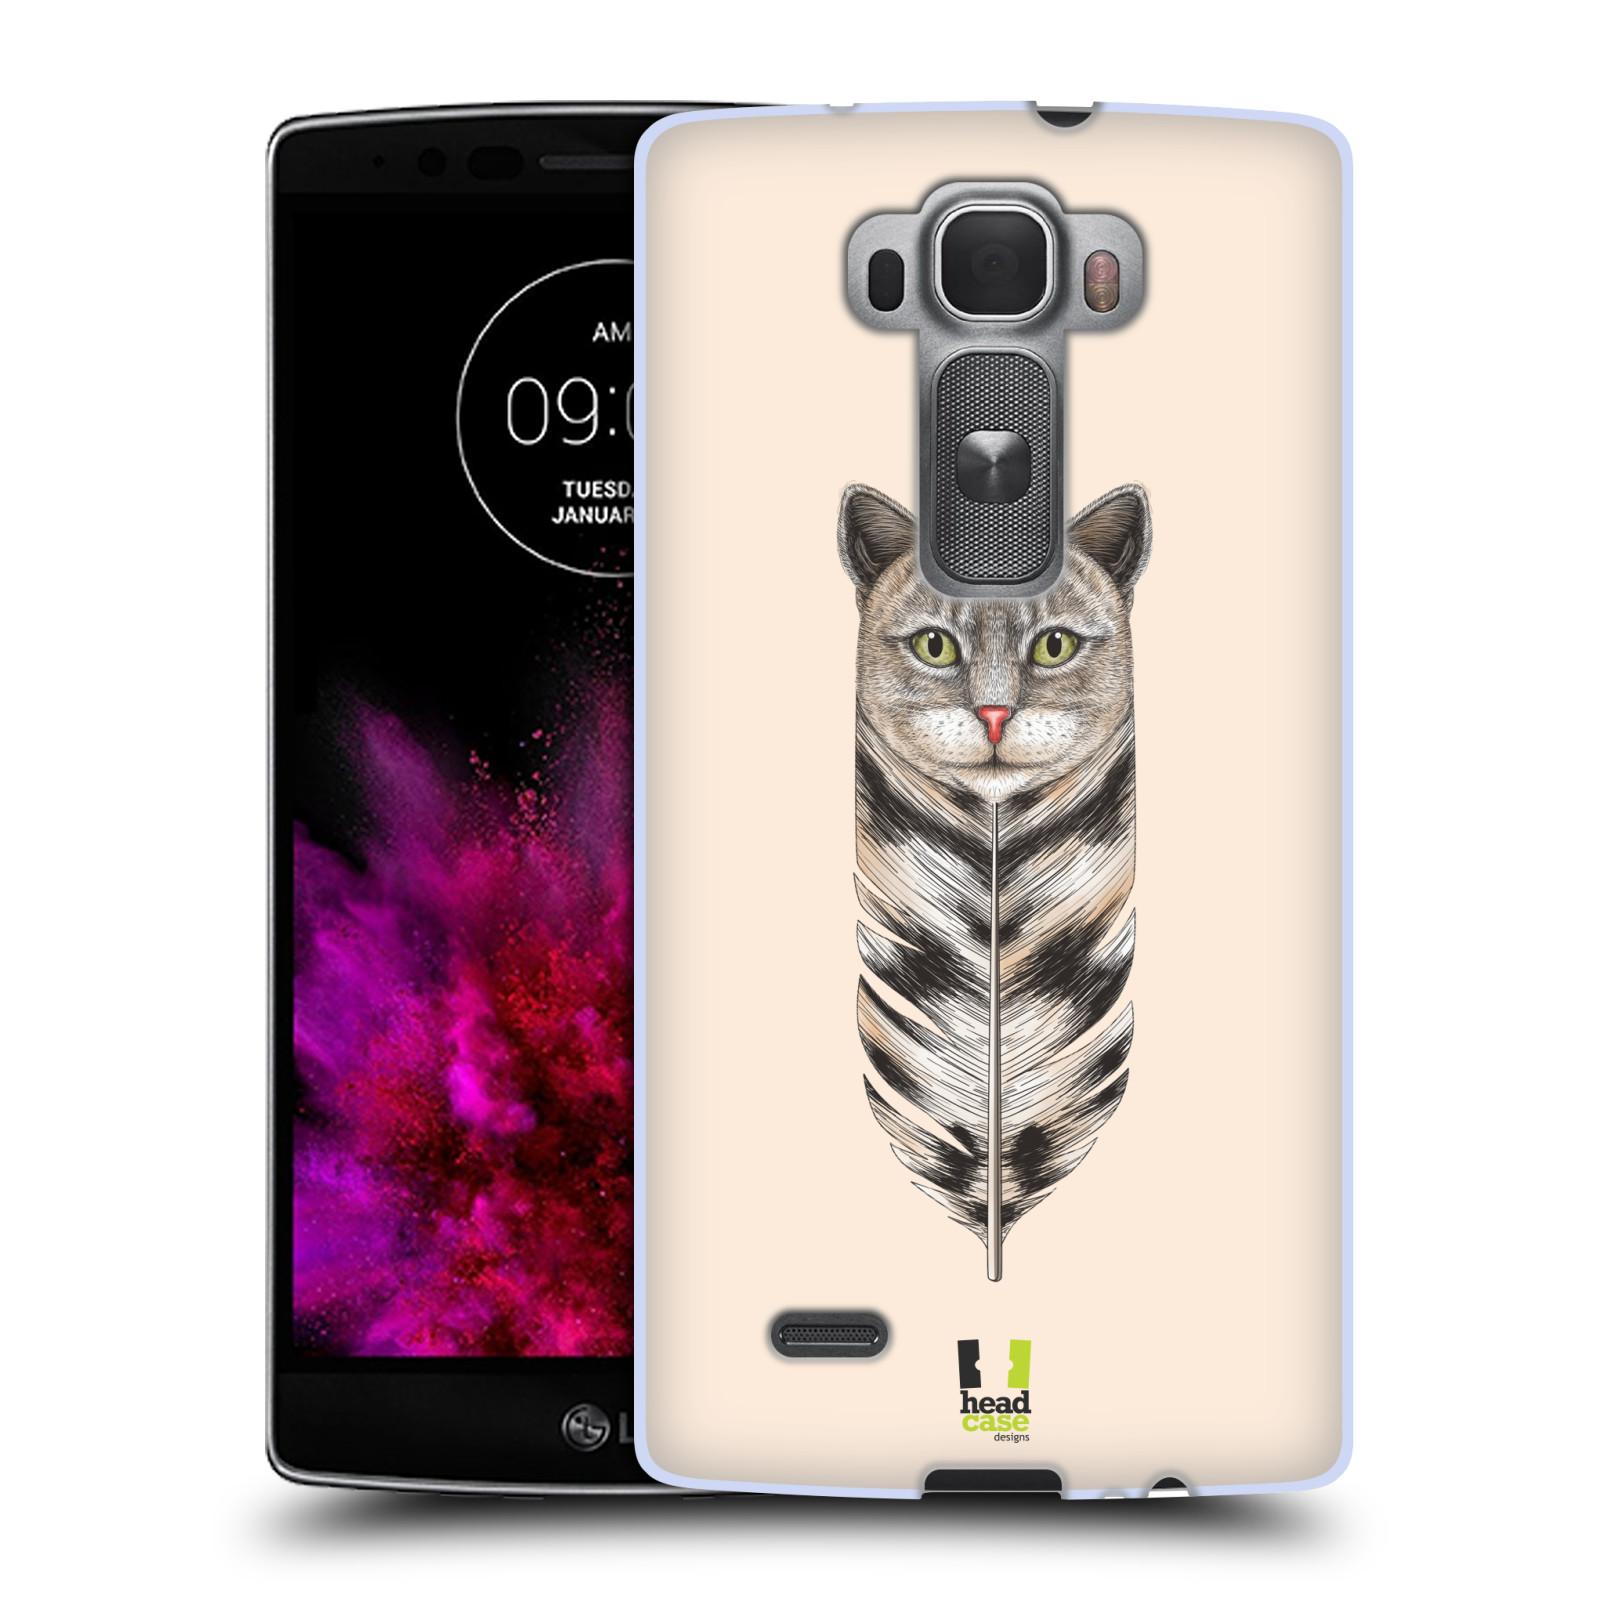 Silikonové pouzdro na mobil LG G Flex 2 HEAD CASE PÍRKO KOČKA (Silikonový kryt či obal na mobilní telefon LG G Flex 2 H955)